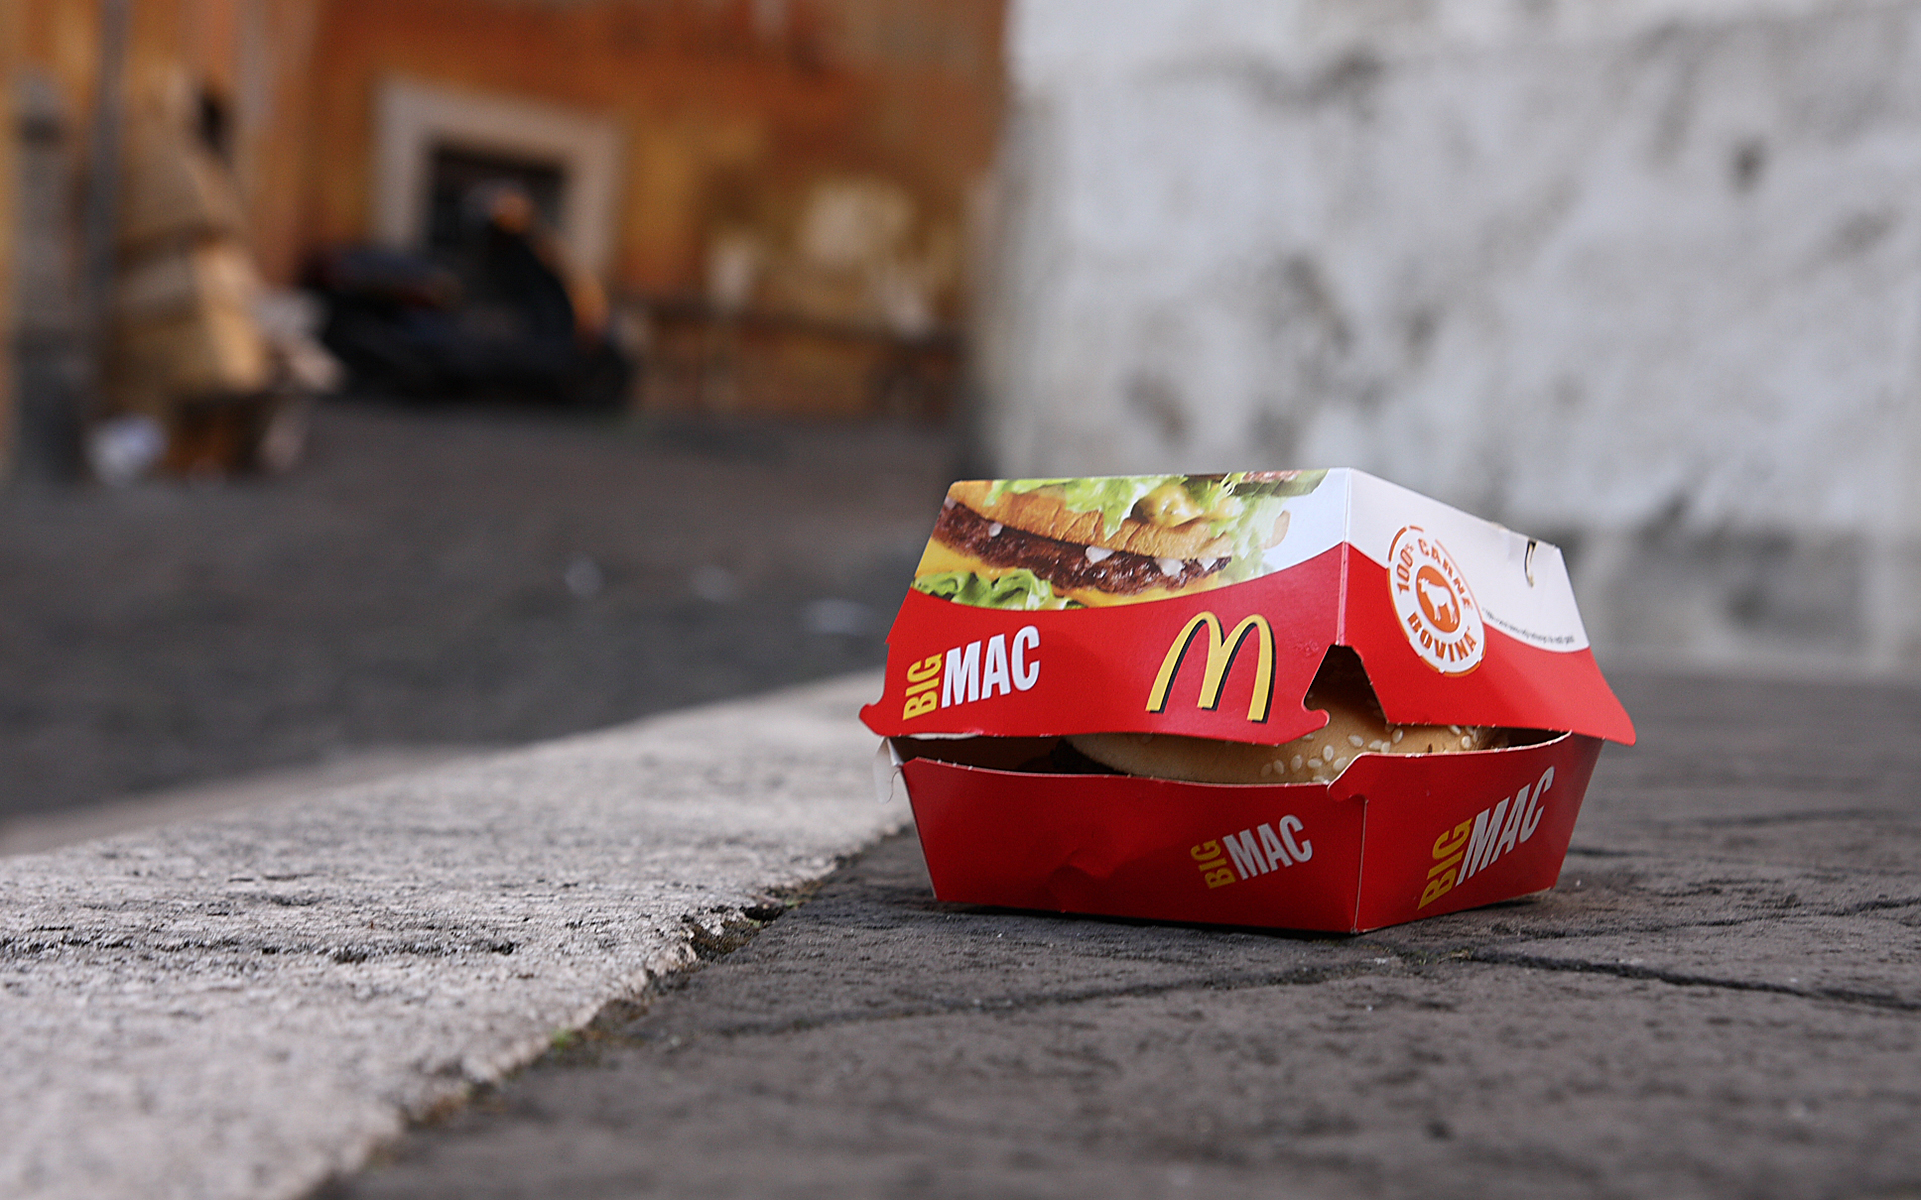 Yo Dawg, Celebrate the Big Mac With a Big Mac and Some Big Mac